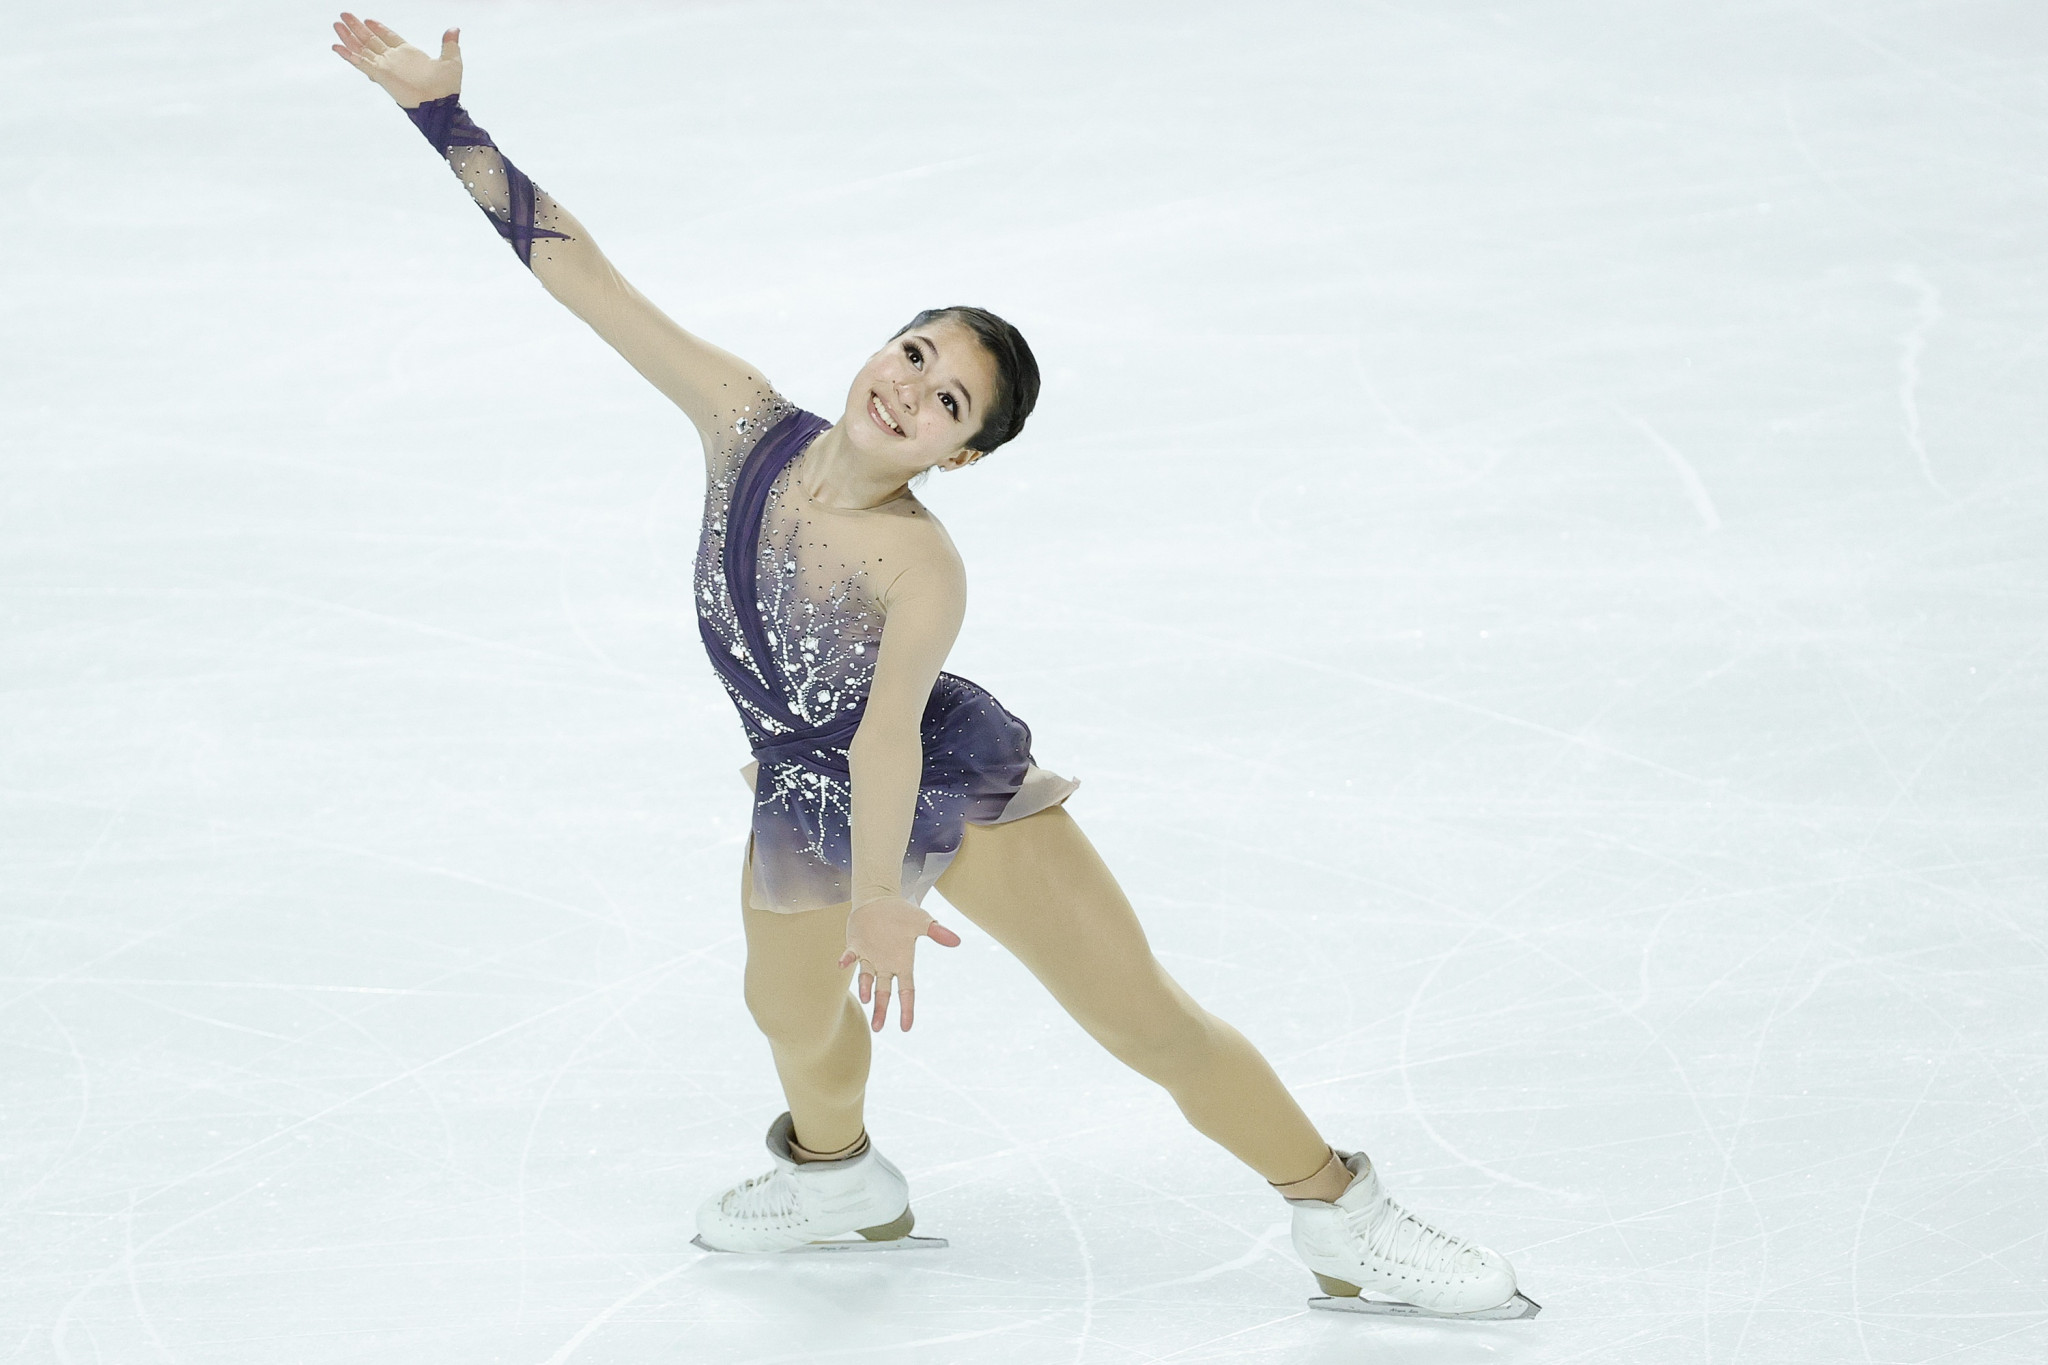 Liu wins Nebelhorn Trophy crown to bag third Beijing 2022 quota for US